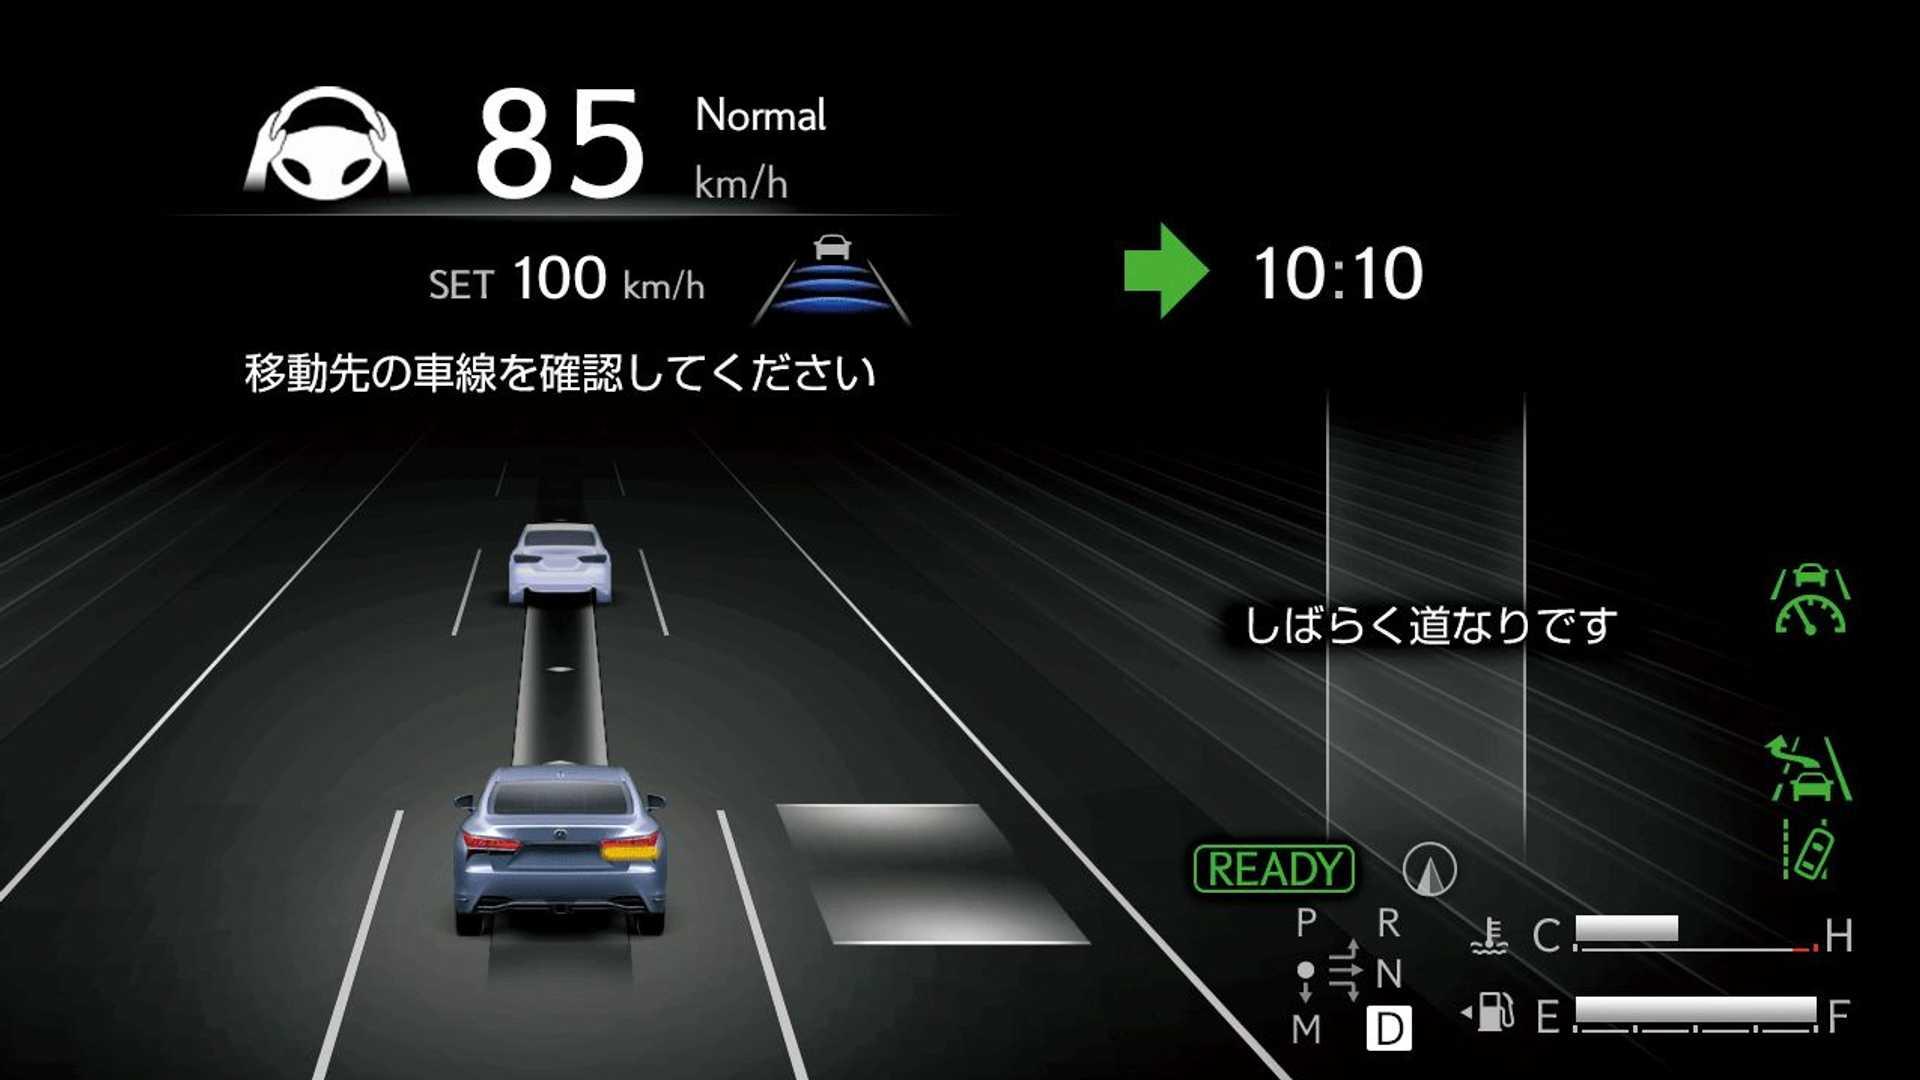 Lexus-LS-And-Toyota-Mirai-Advanced-Drive-13